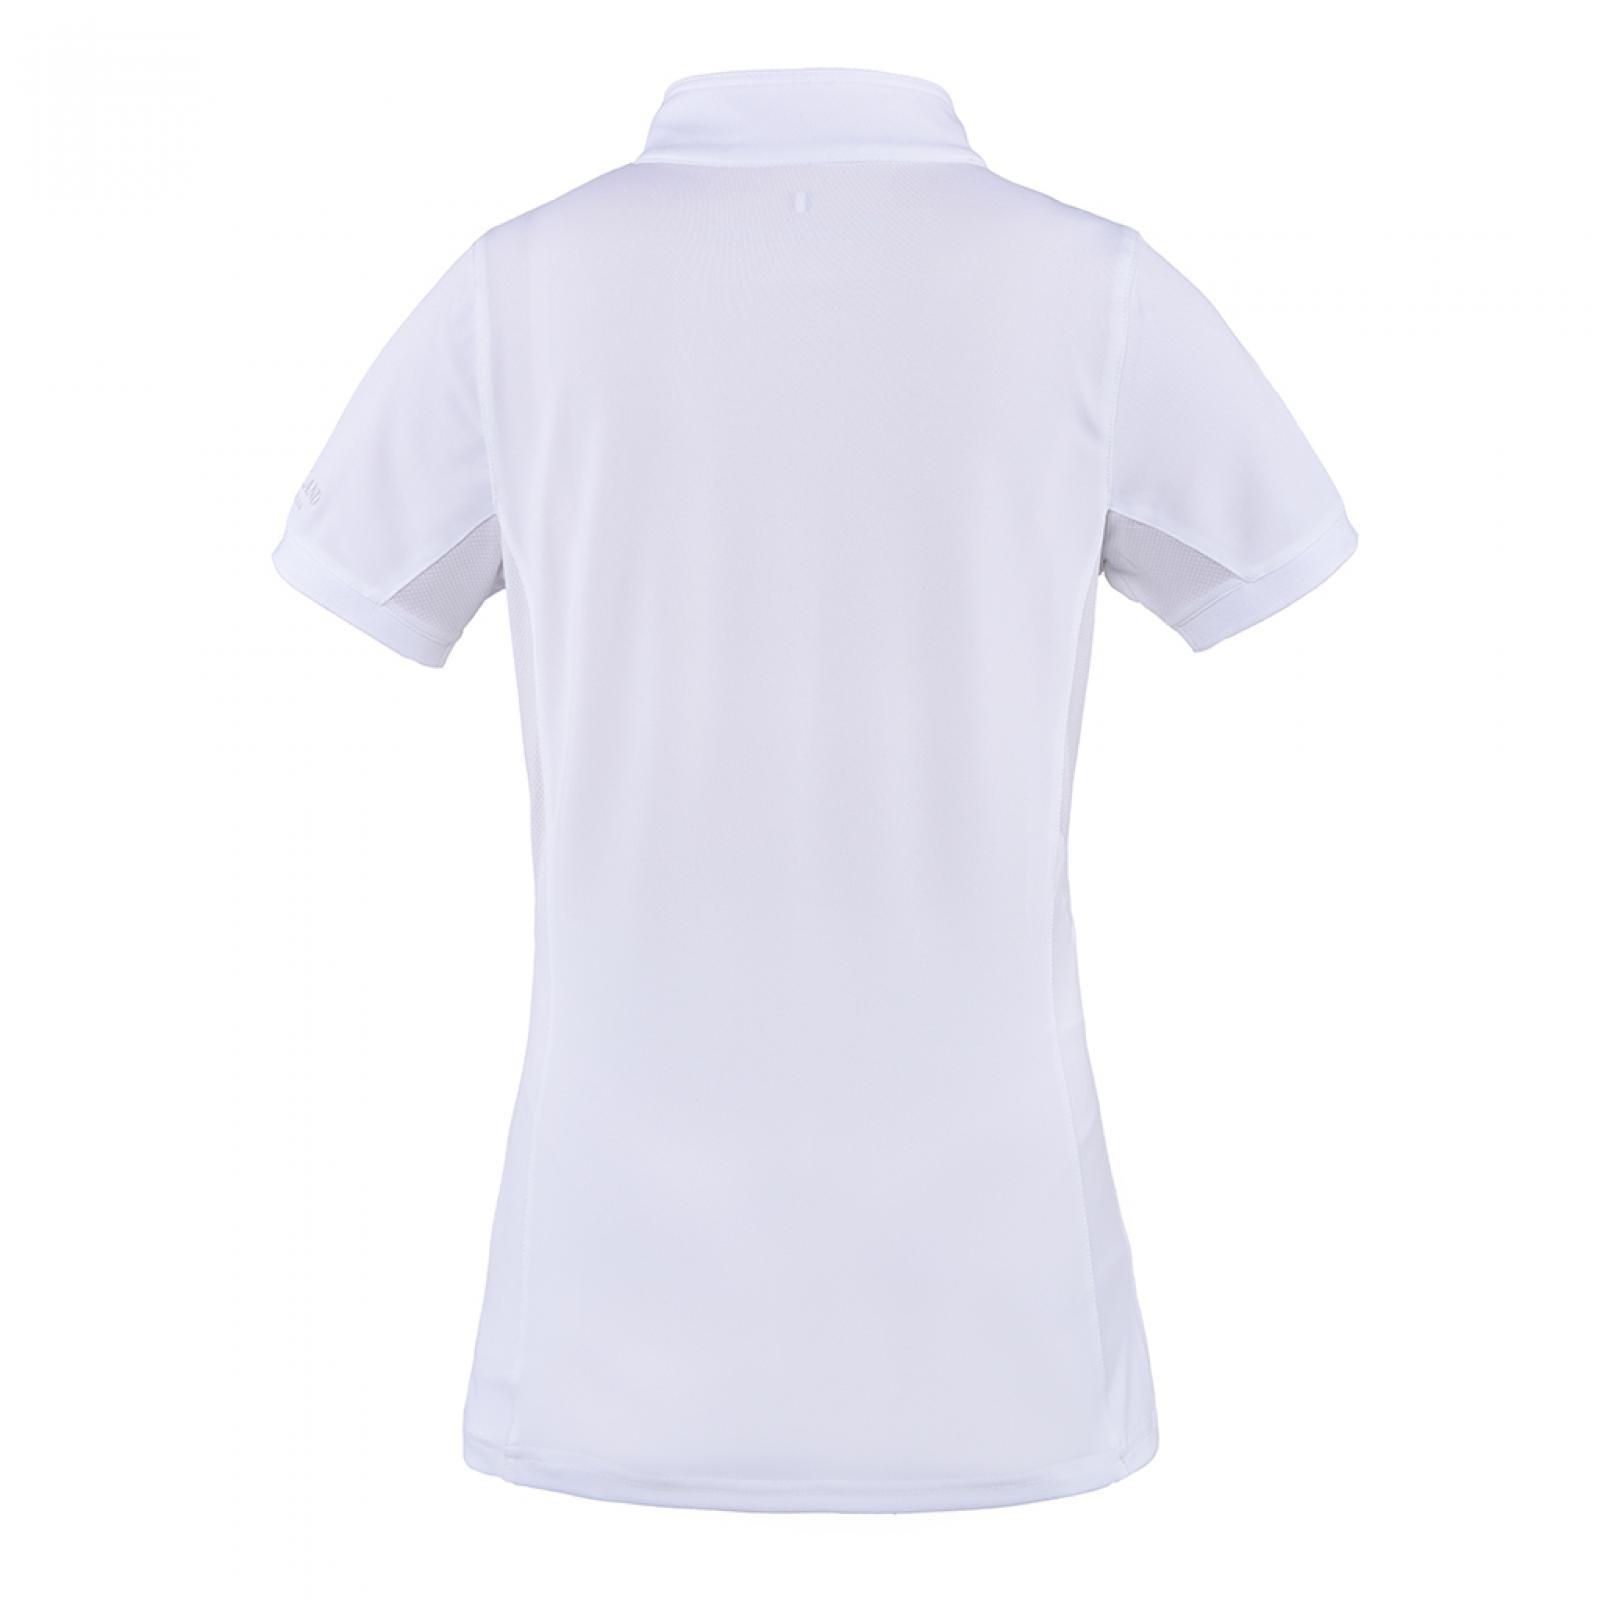 Kingsland Kingsland - Classic girls short sleeve show shirt white